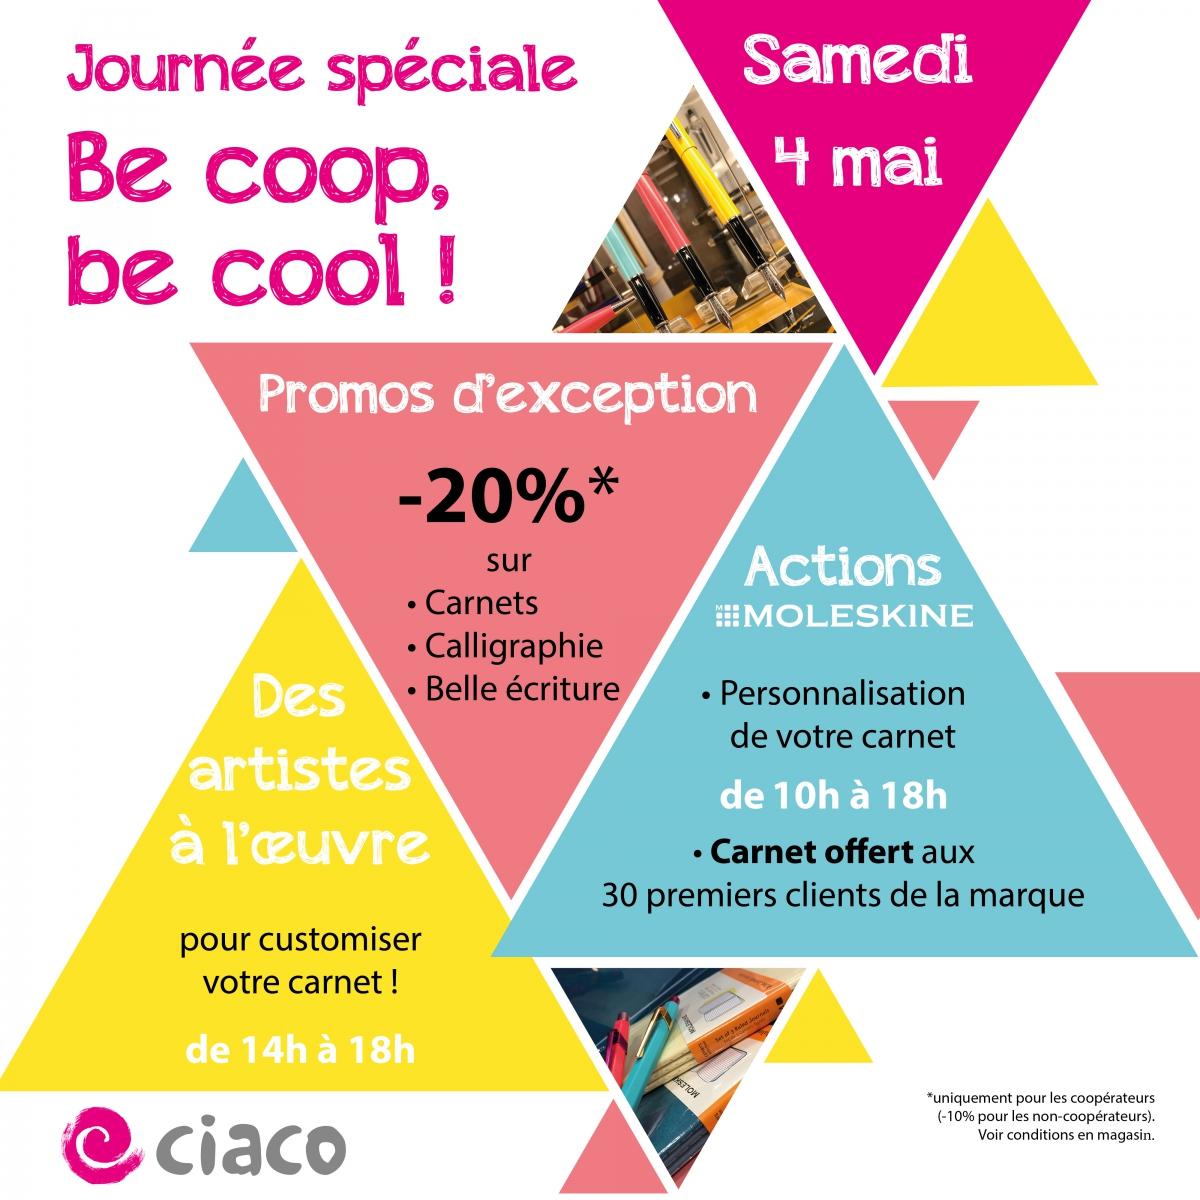 Journée spéciale Be coop, be cool ! - 4 mai 2019